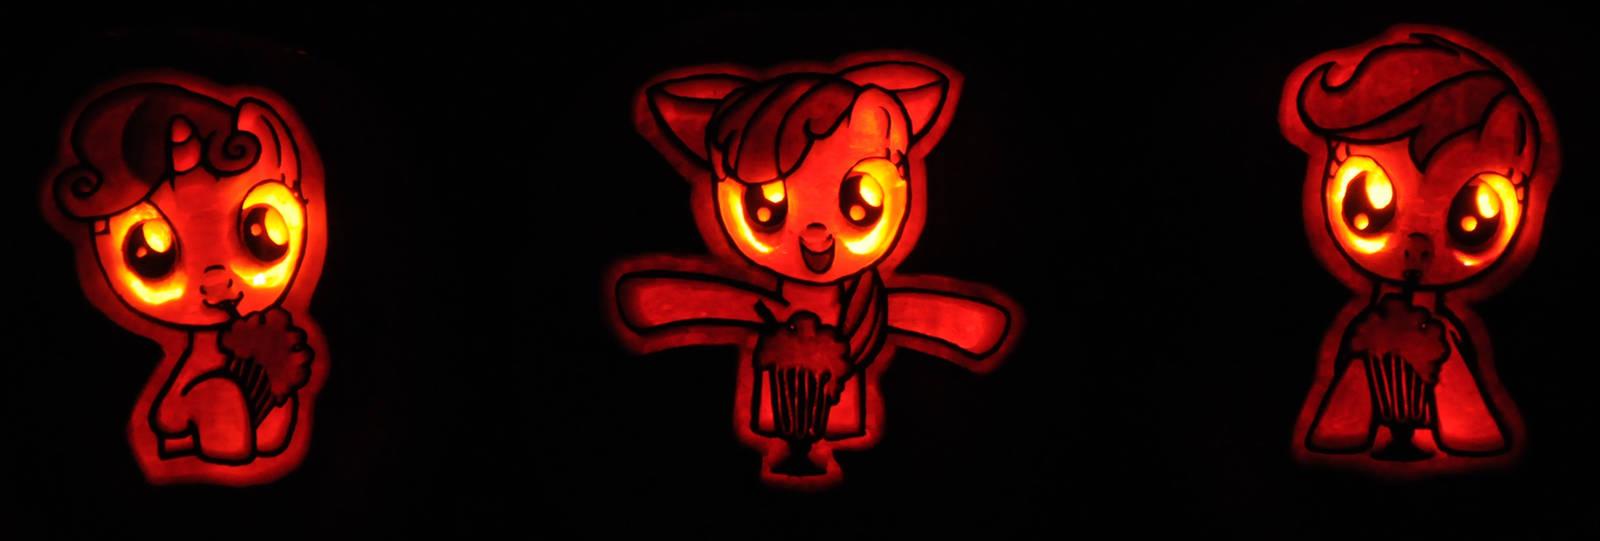 Cutie Mark Crusaders Pumpkins by archiveit1